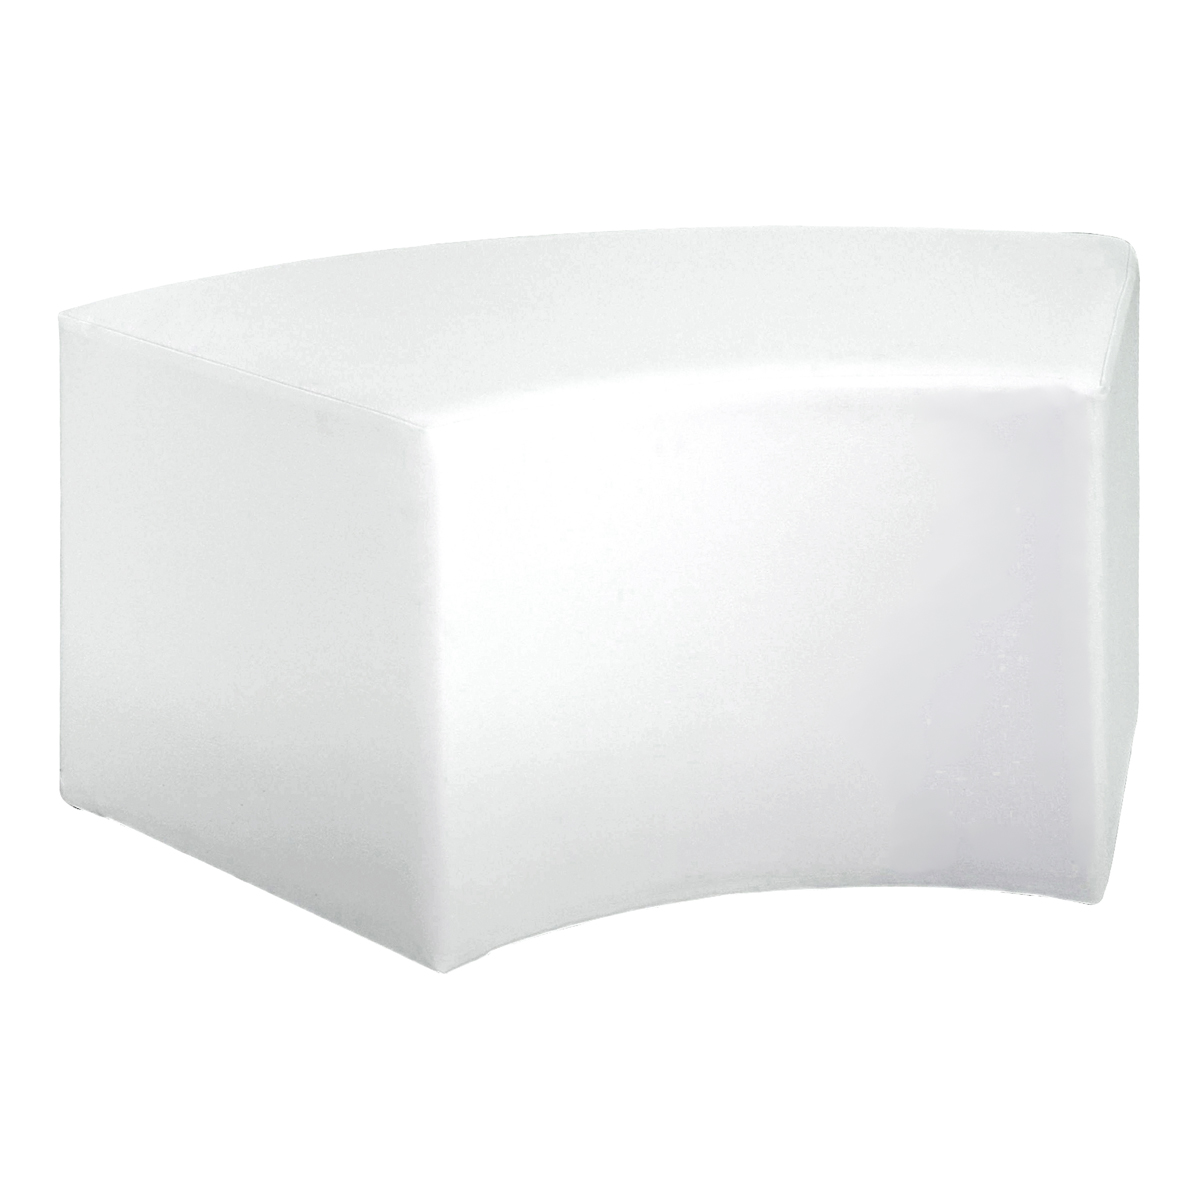 Hocker Cubi Curve, weiß